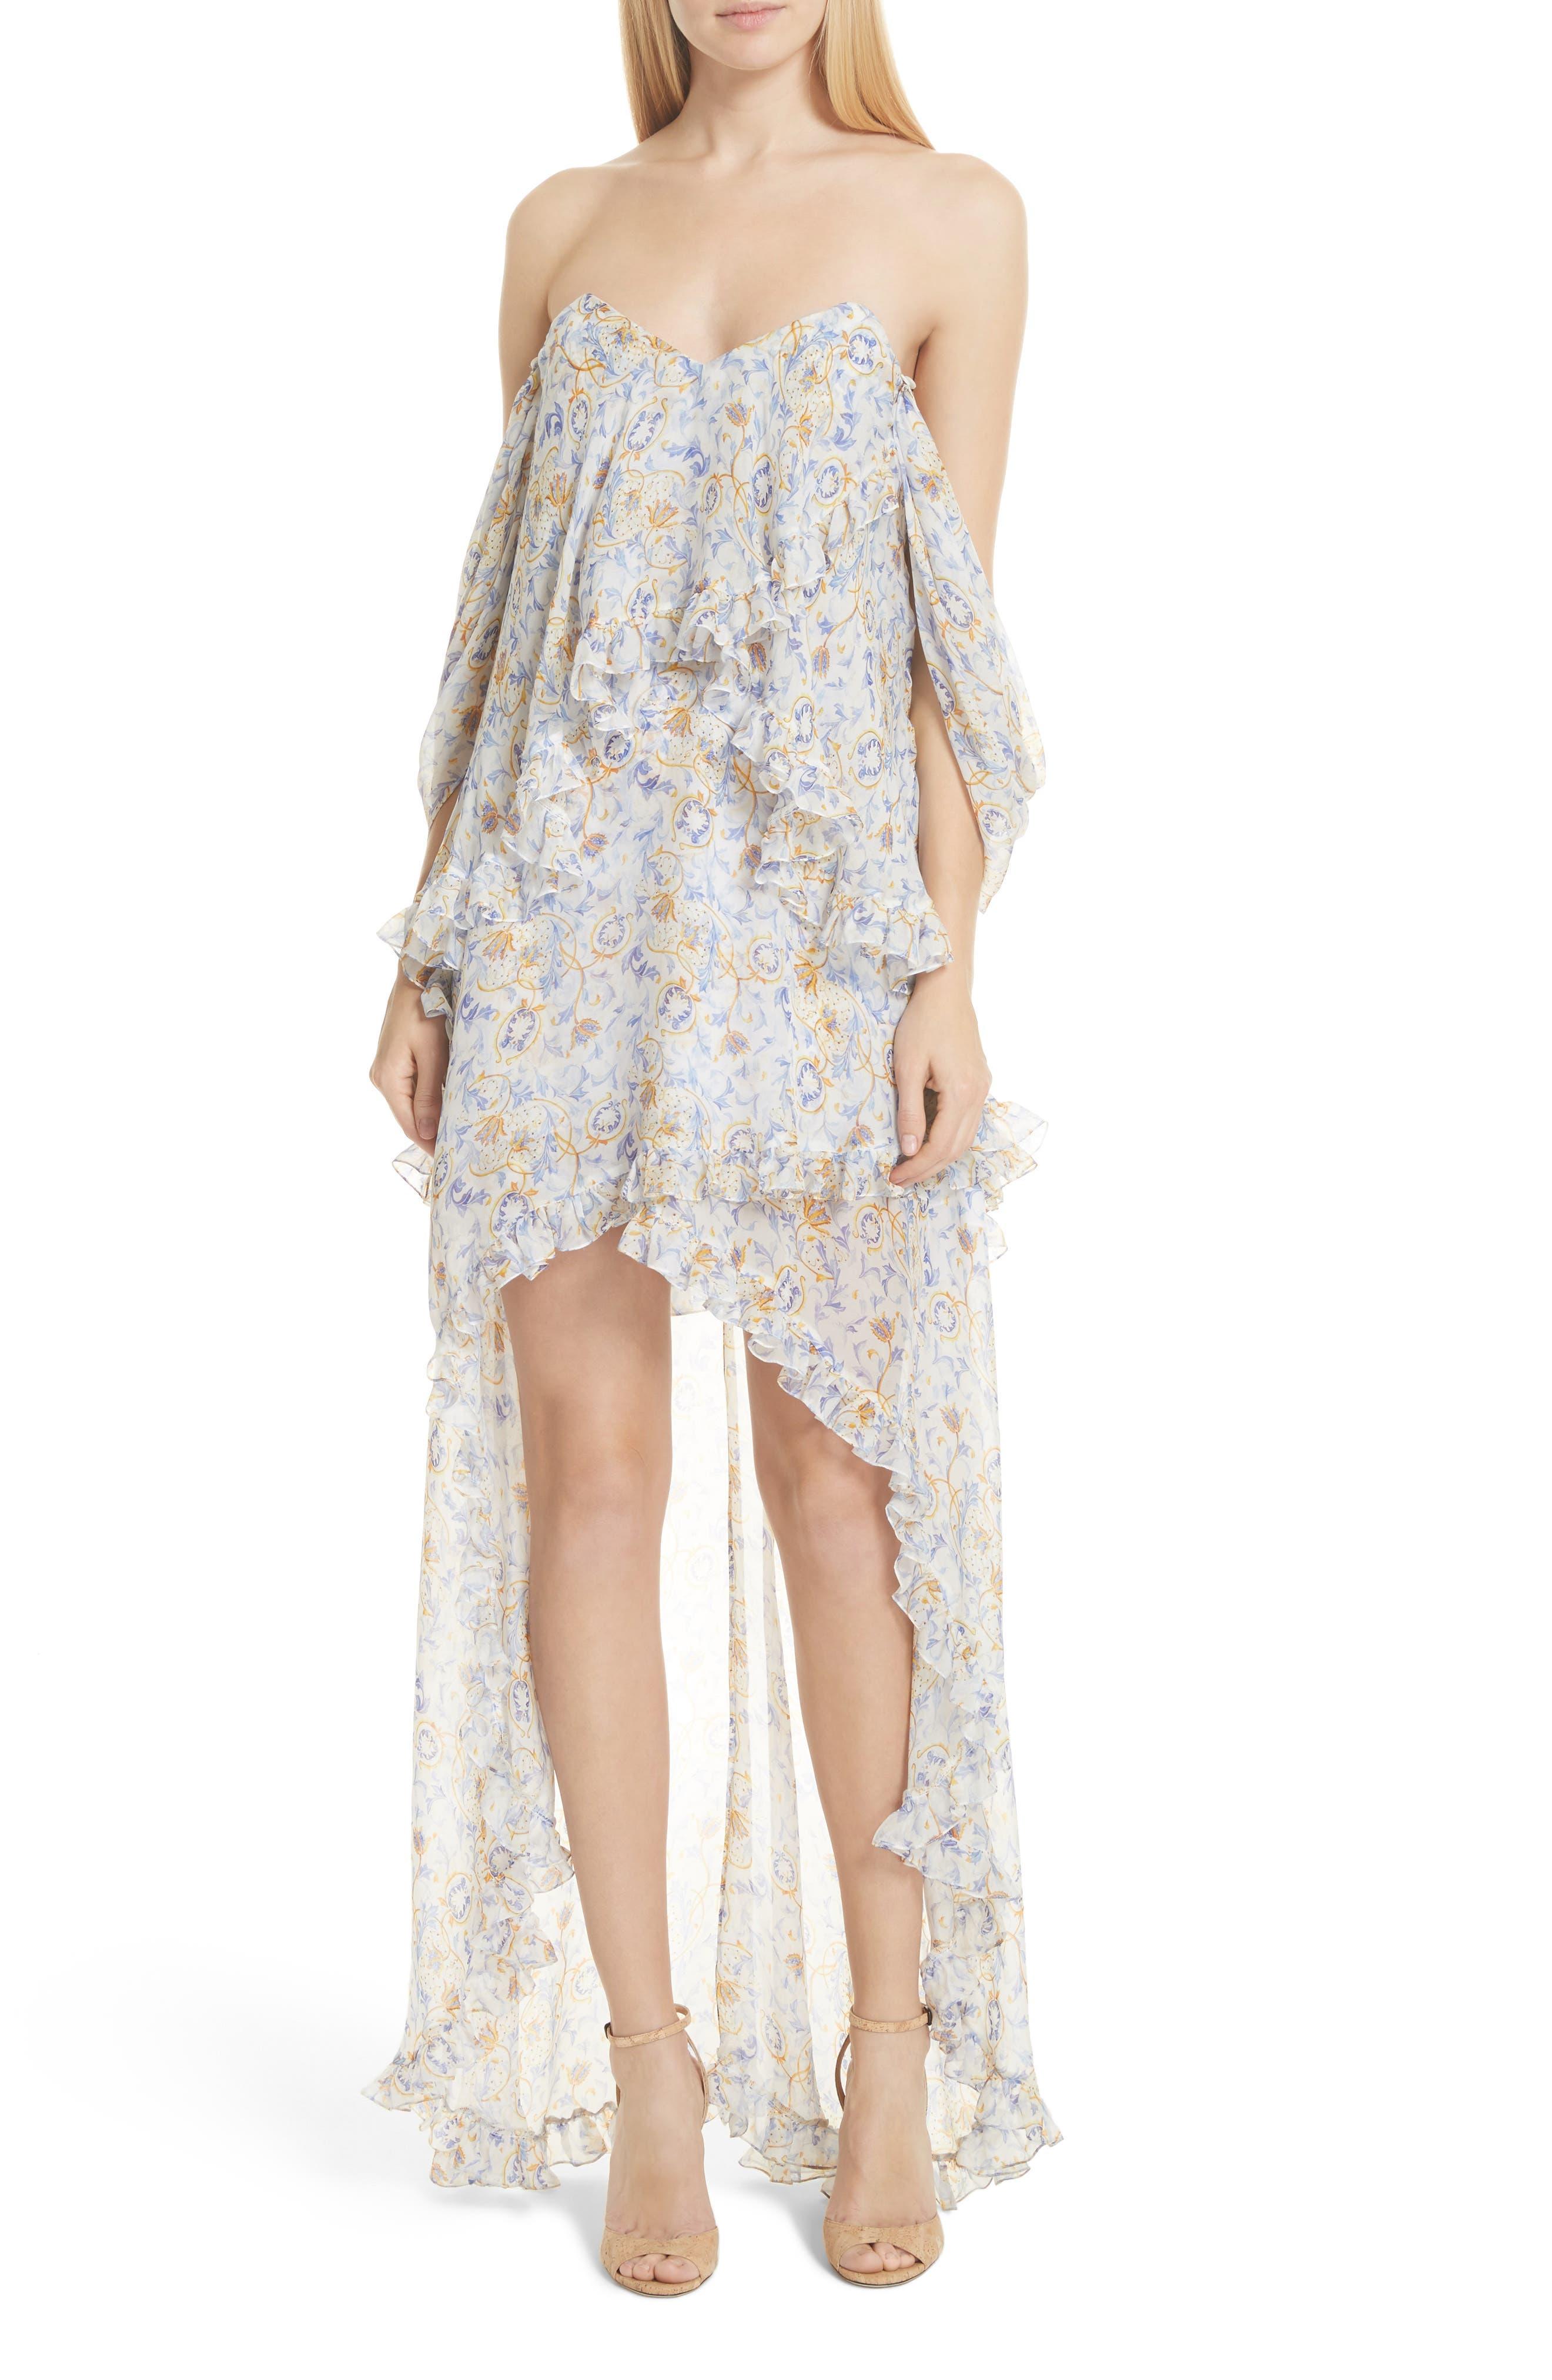 Superieur Caroline Constas Melina Off The Shoulder High/Low Dress